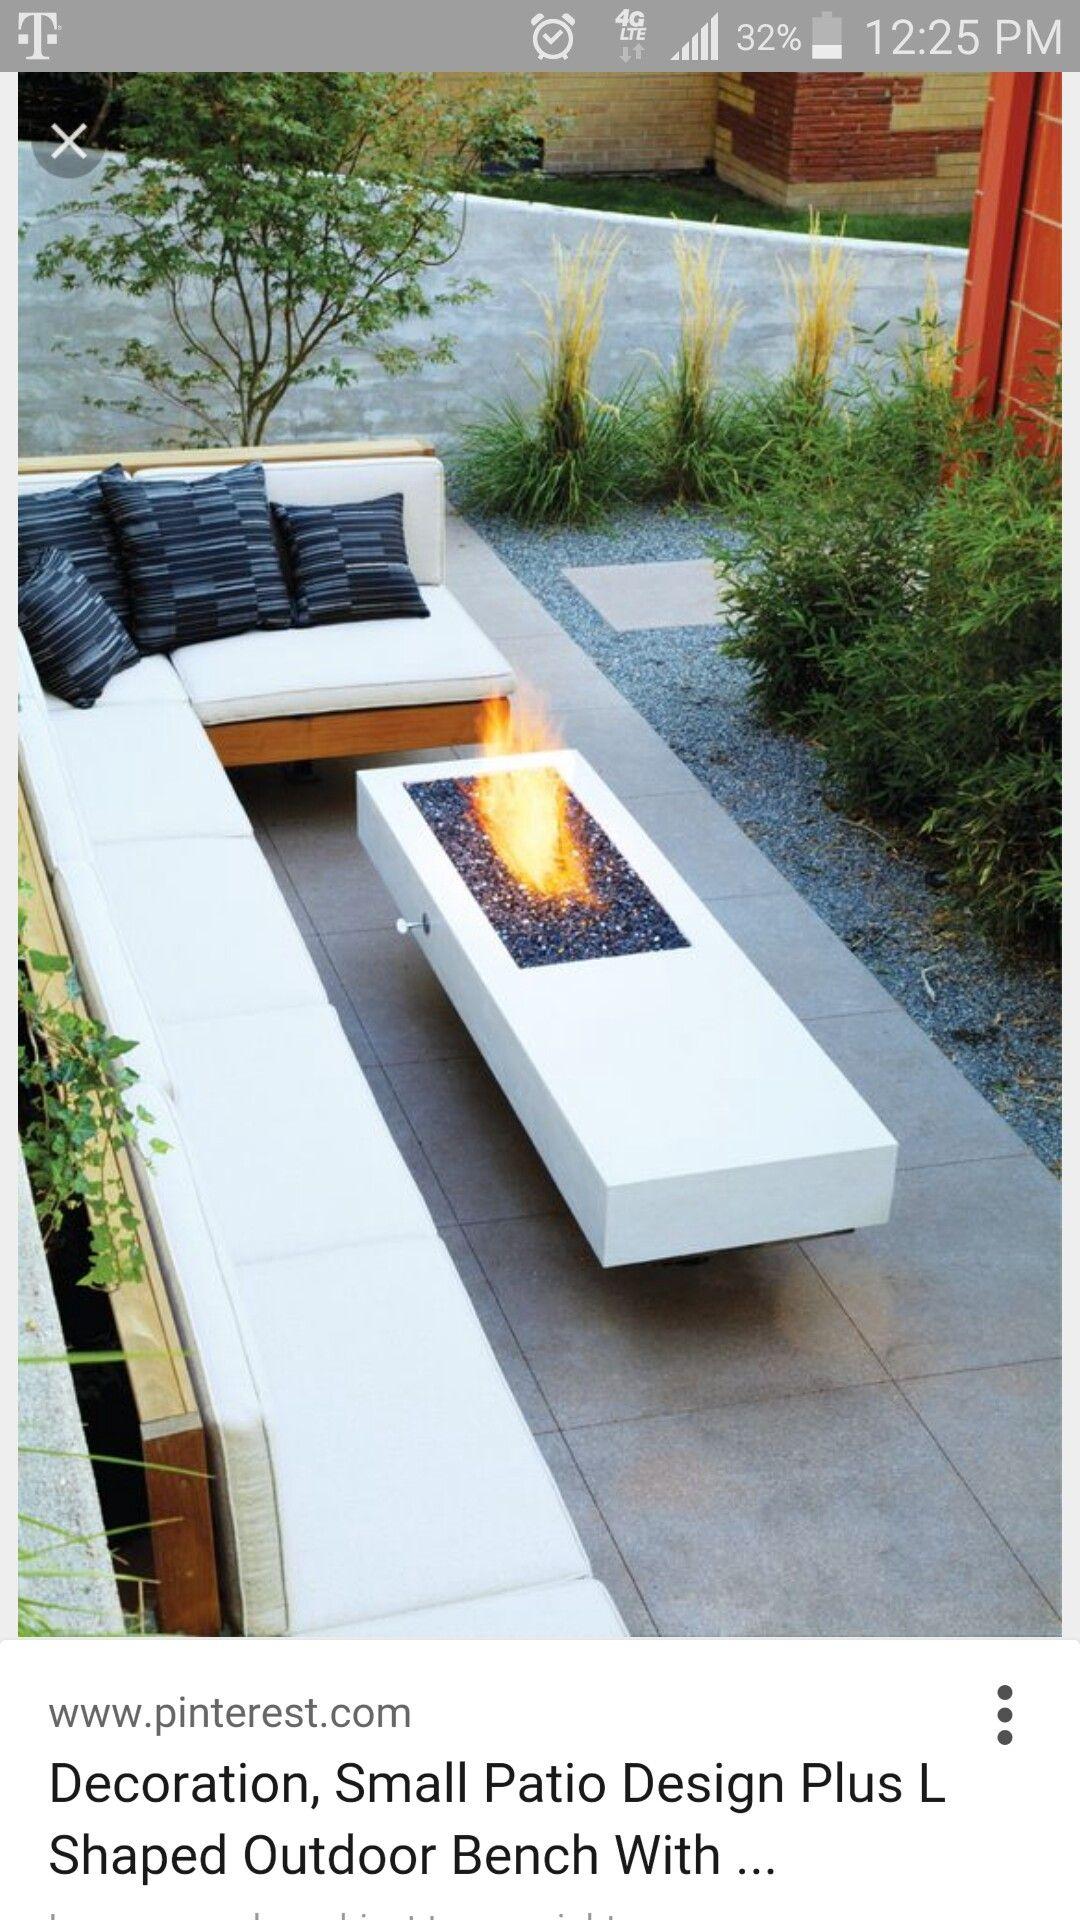 Sleek Modern Concrete Firepit Built Into Coffee Table Backyard Narrow Backyard Ideas Backyard Fire Modern outdoor fire pit ideas